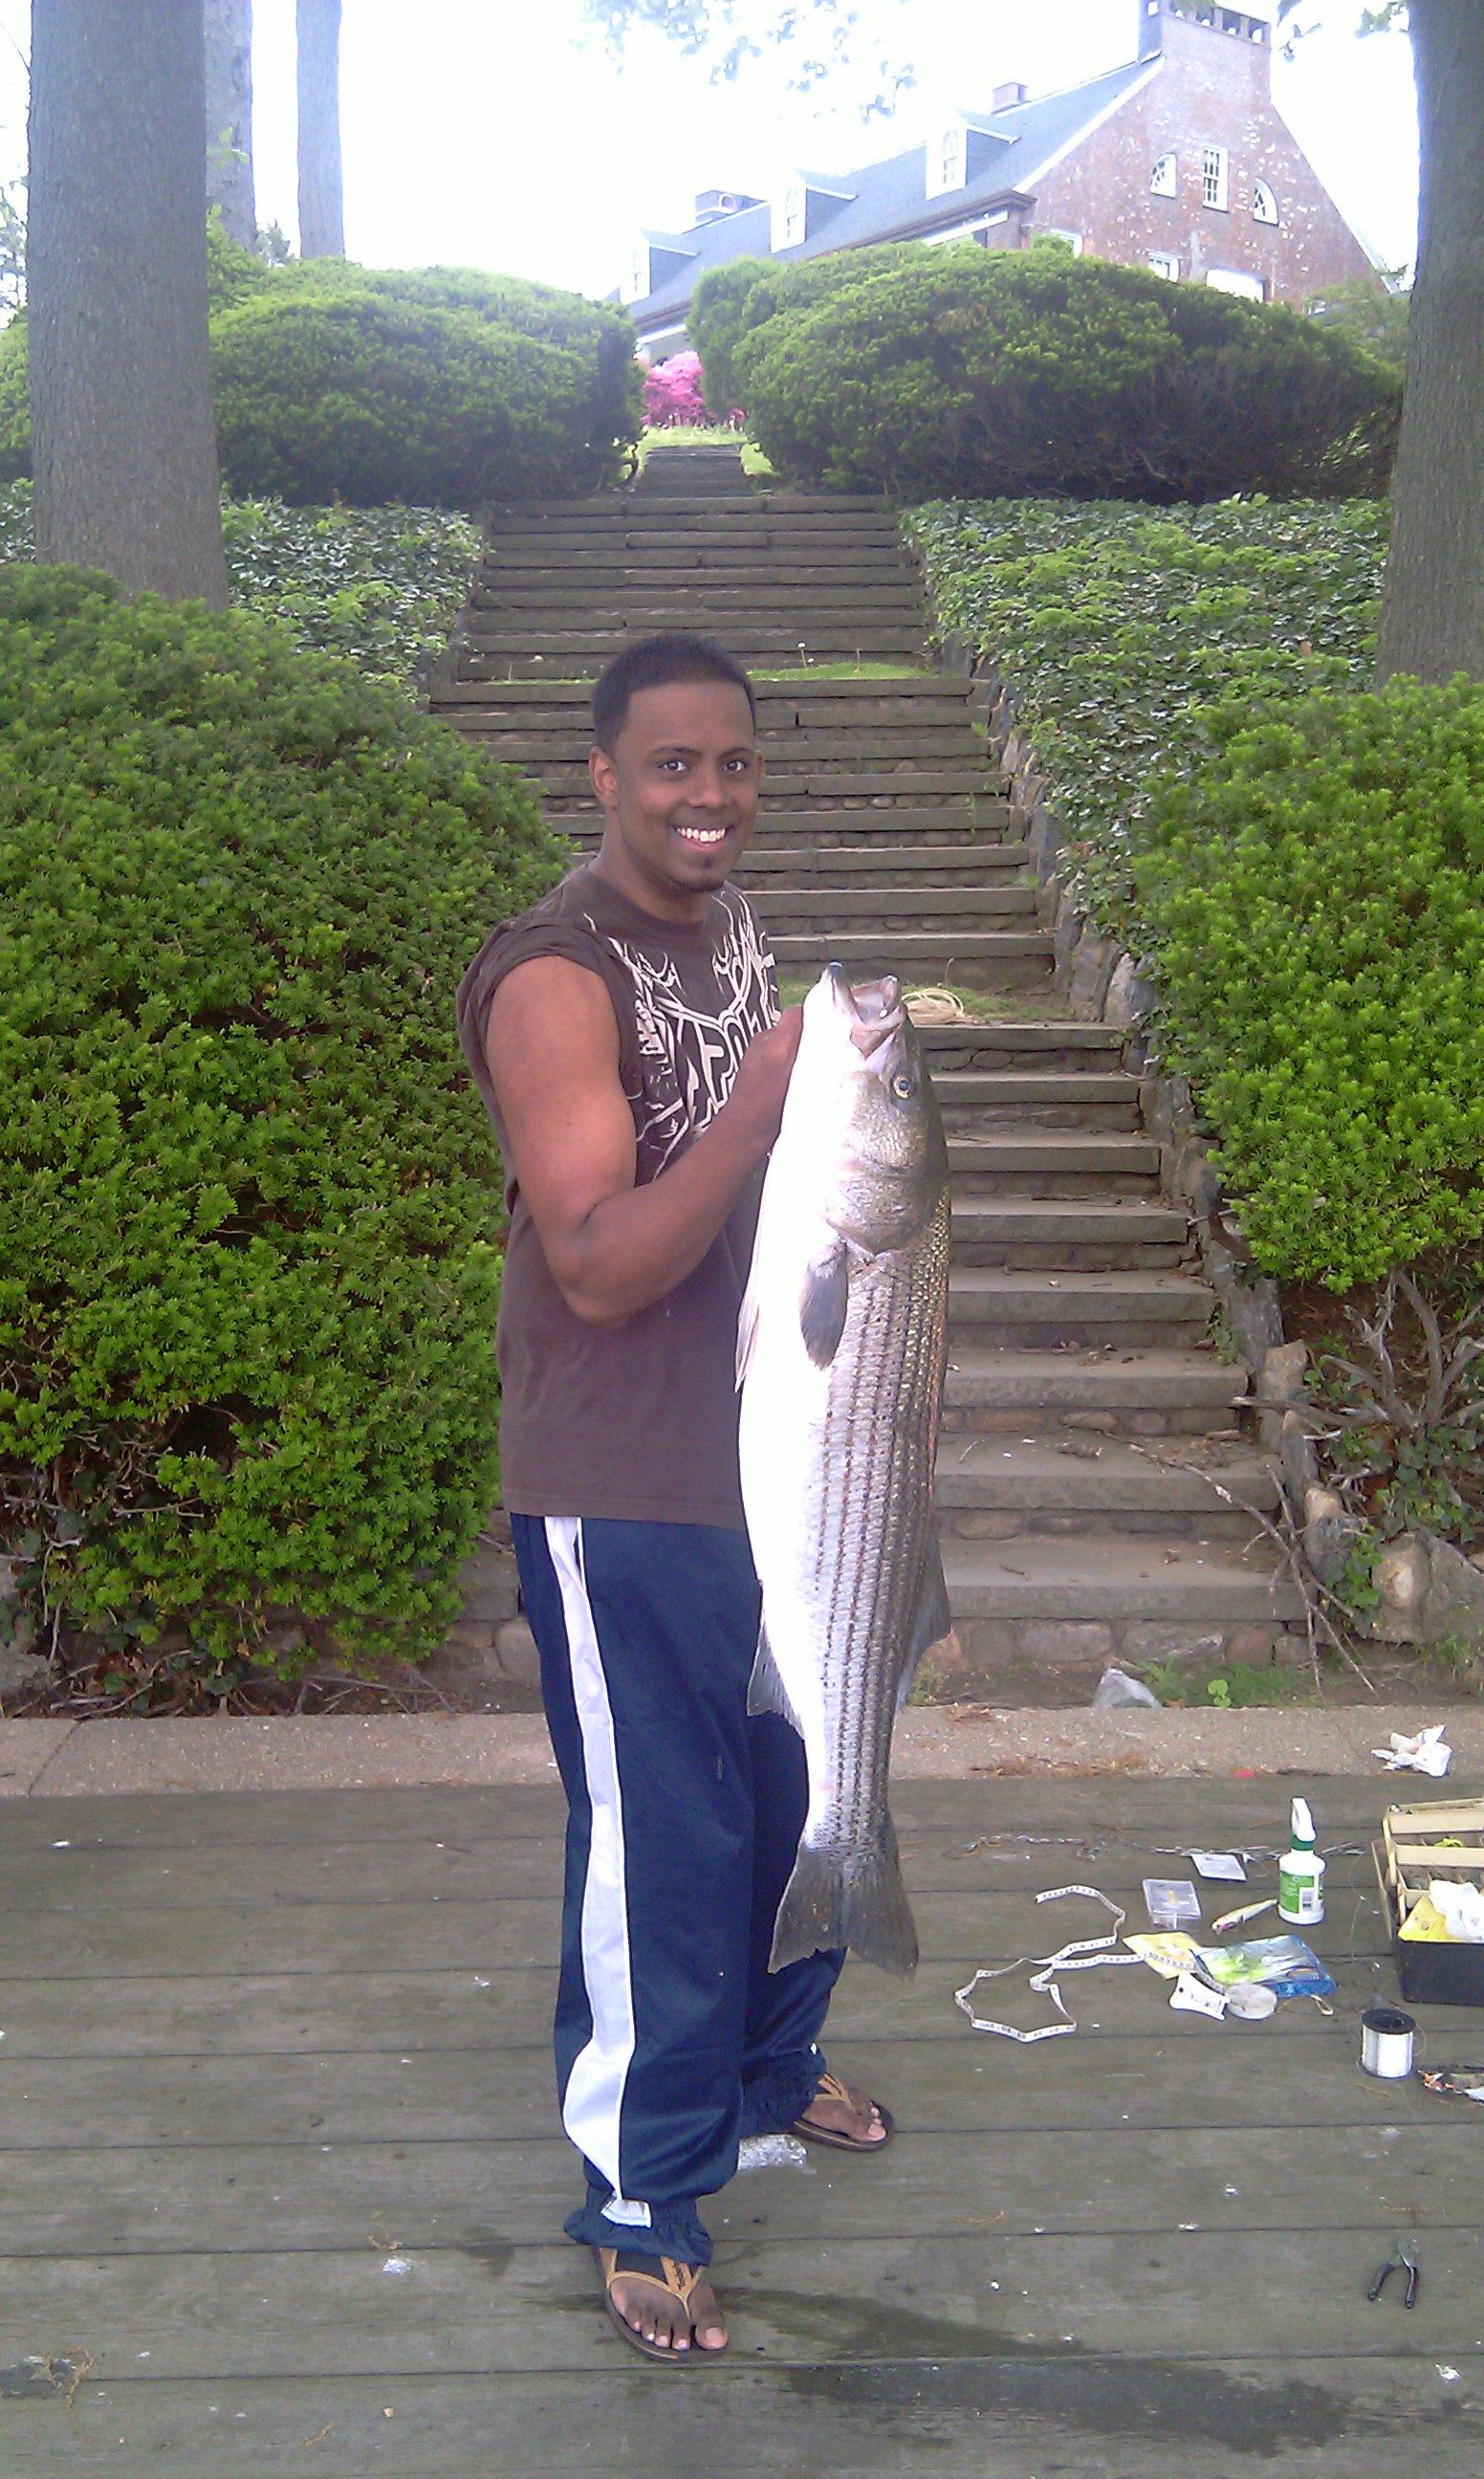 27lb 43 inches